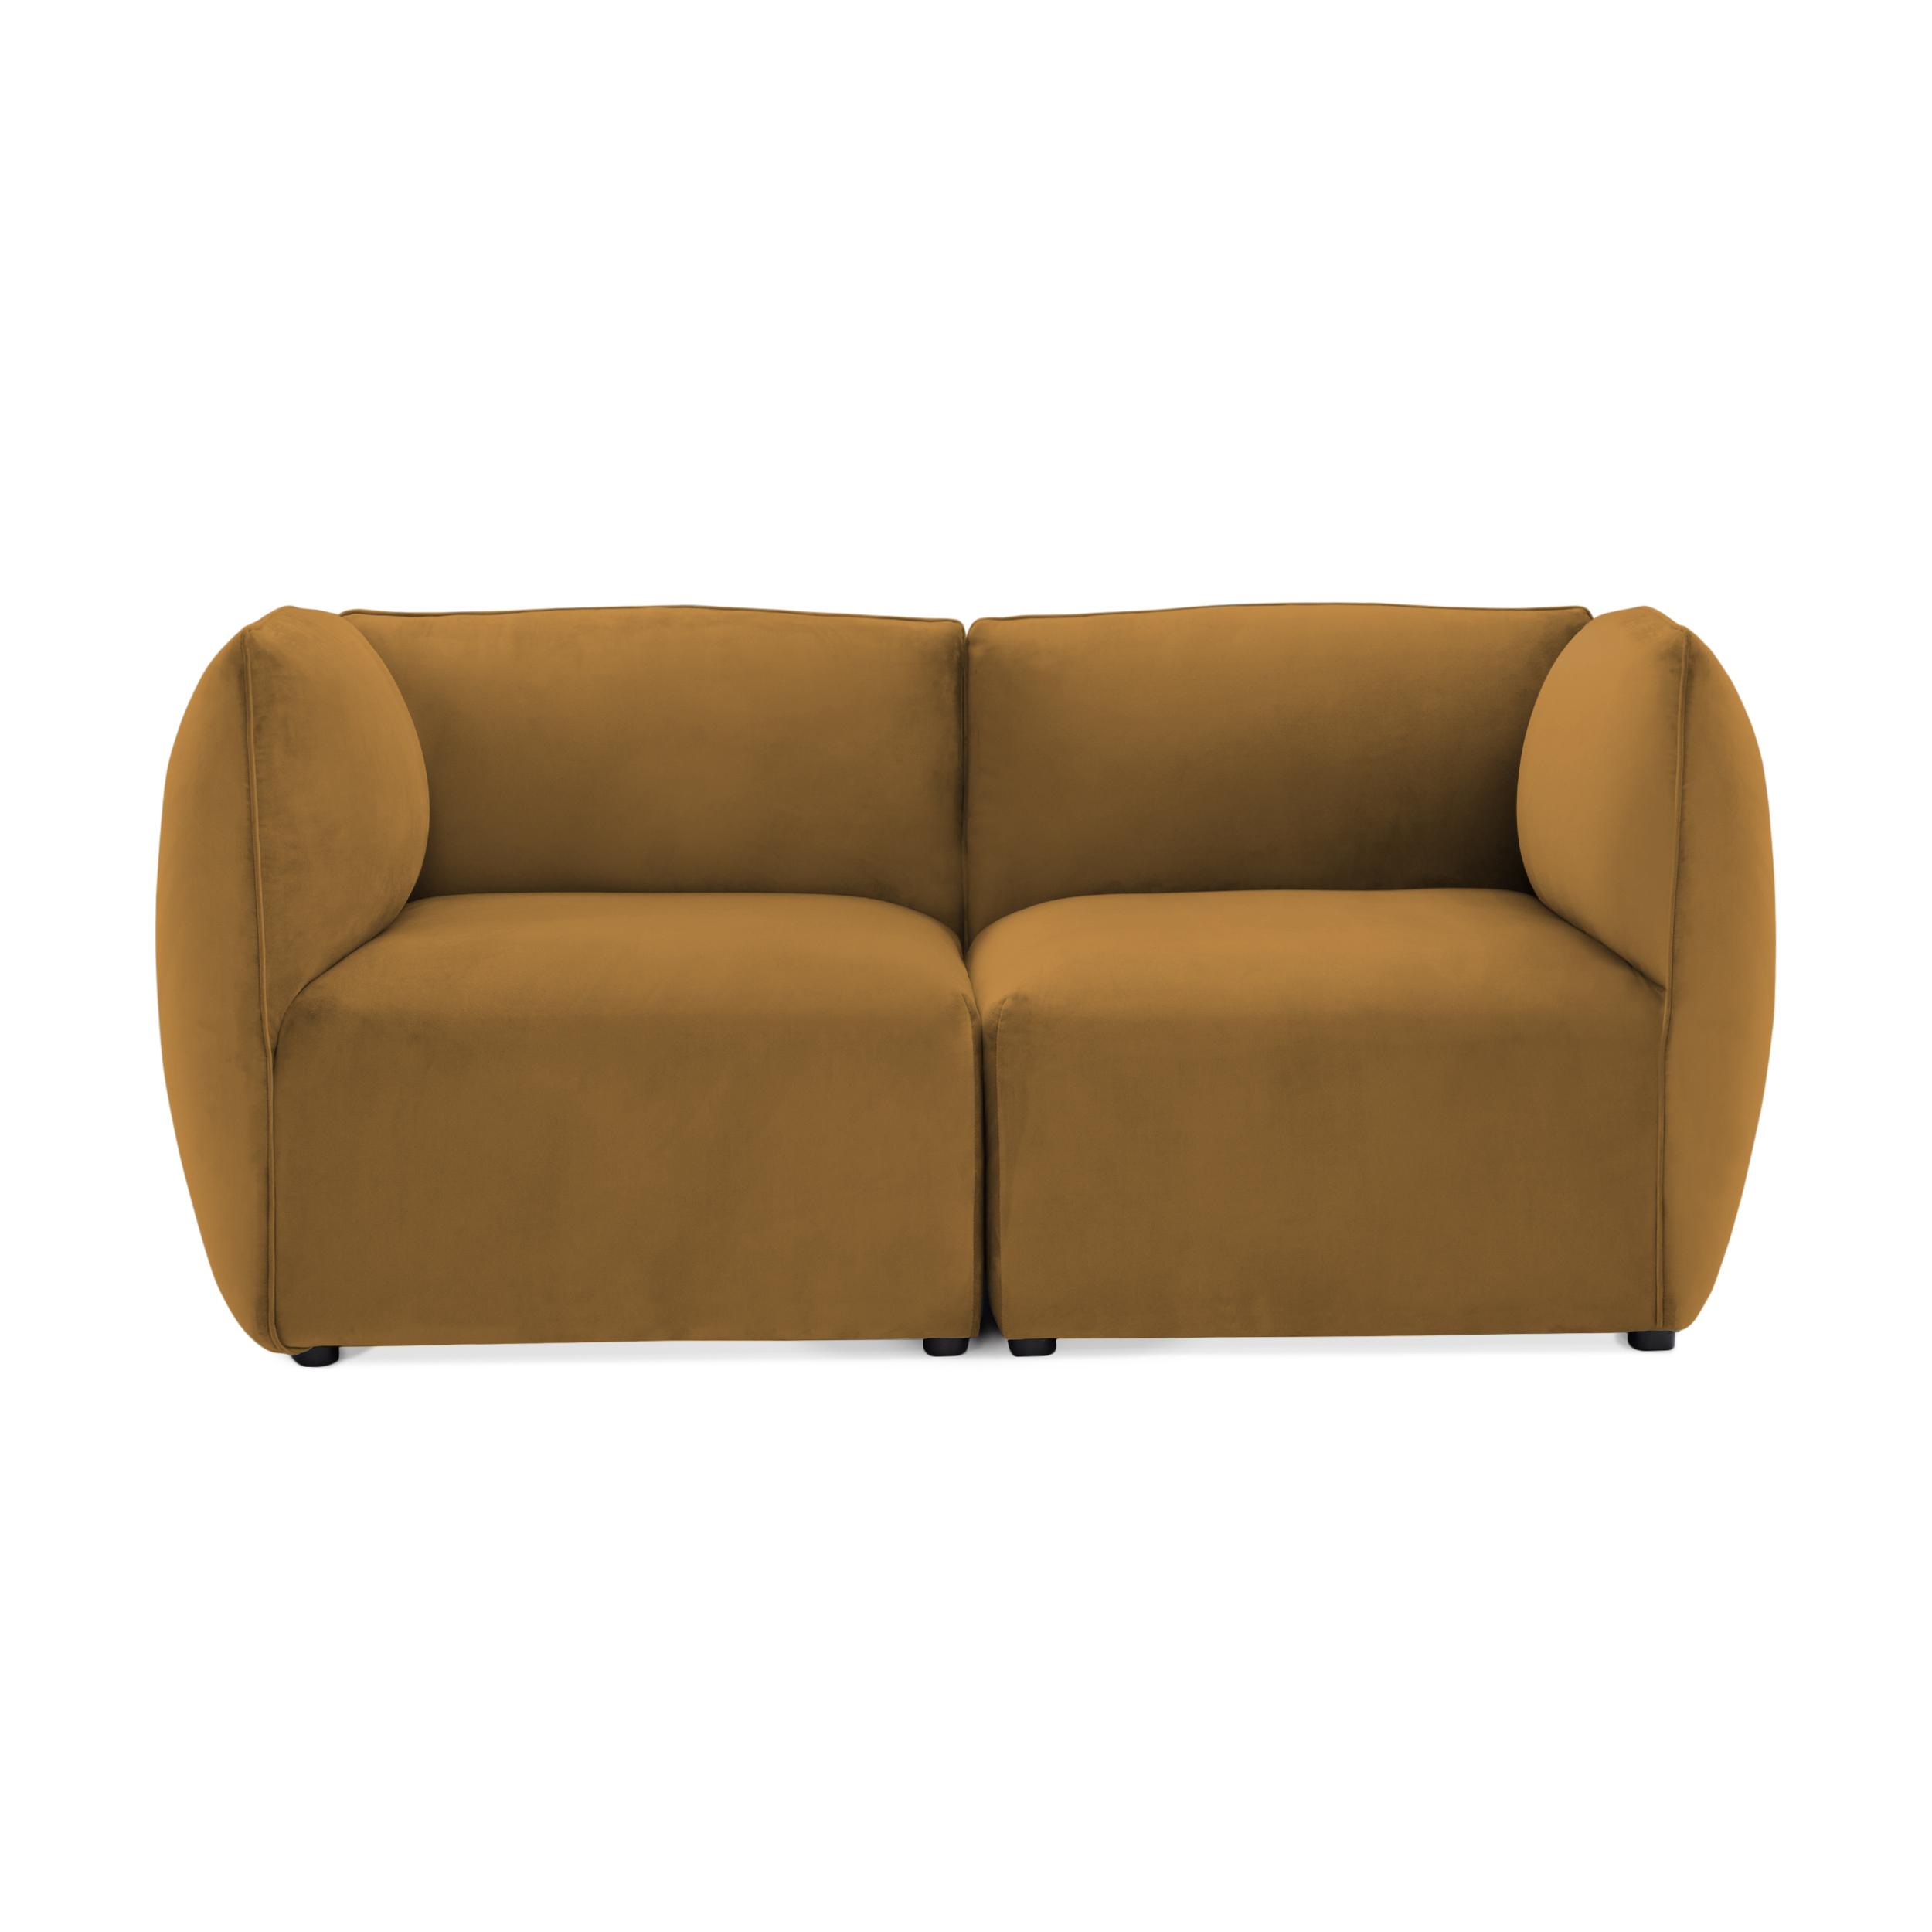 Canapea 2 locuri Cube Mustard